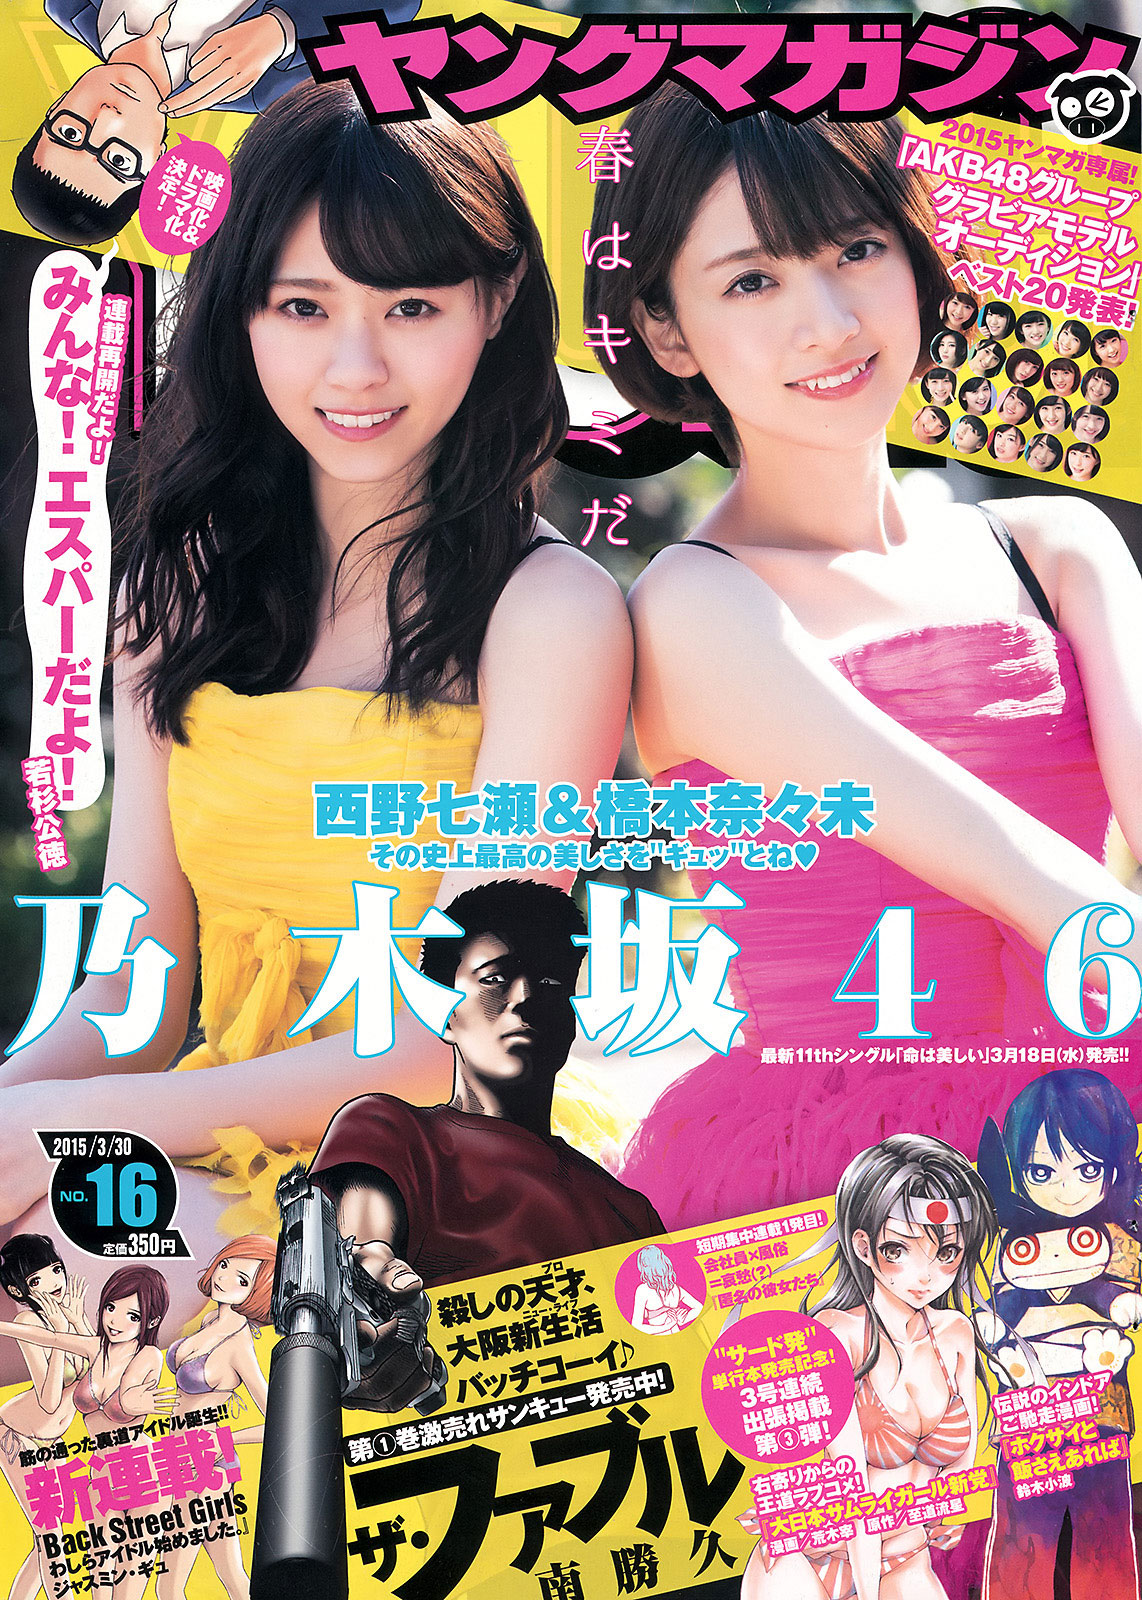 fukagawa single asian girls Former nogizaka46 member fukagawa mai will be the cover girl of japanese magazine cameraman (2018 february issue), the magazine will be released on 20.